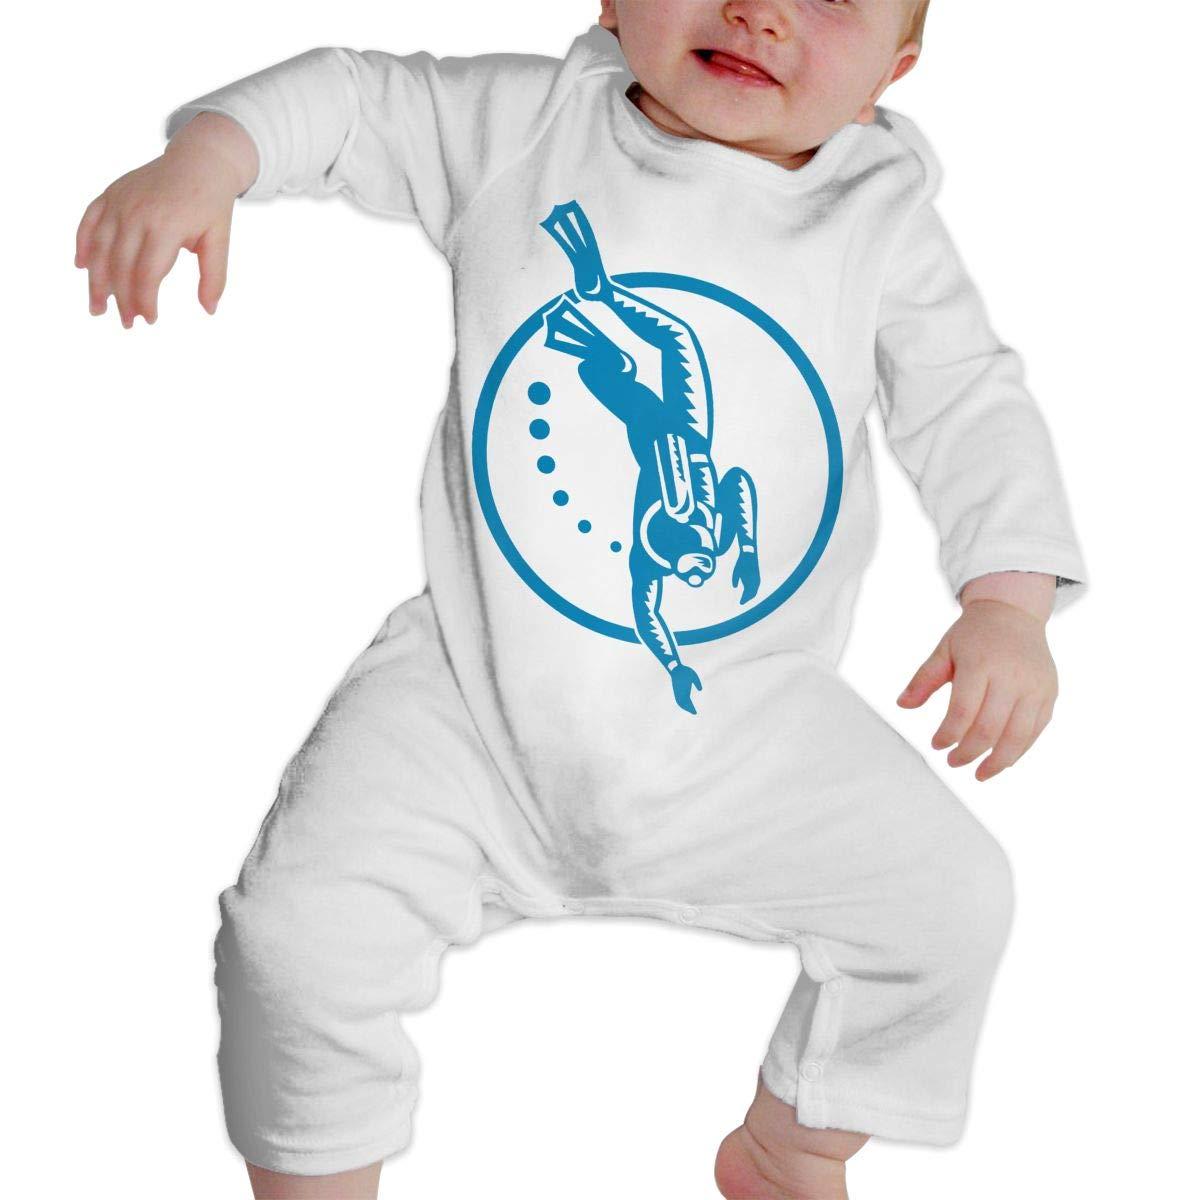 A1BY-5US Baby Infant Toddler Cotton Long Sleeve Scuba Diver Diving Retro Climb Jumpsuit One-Piece Romper Clothes